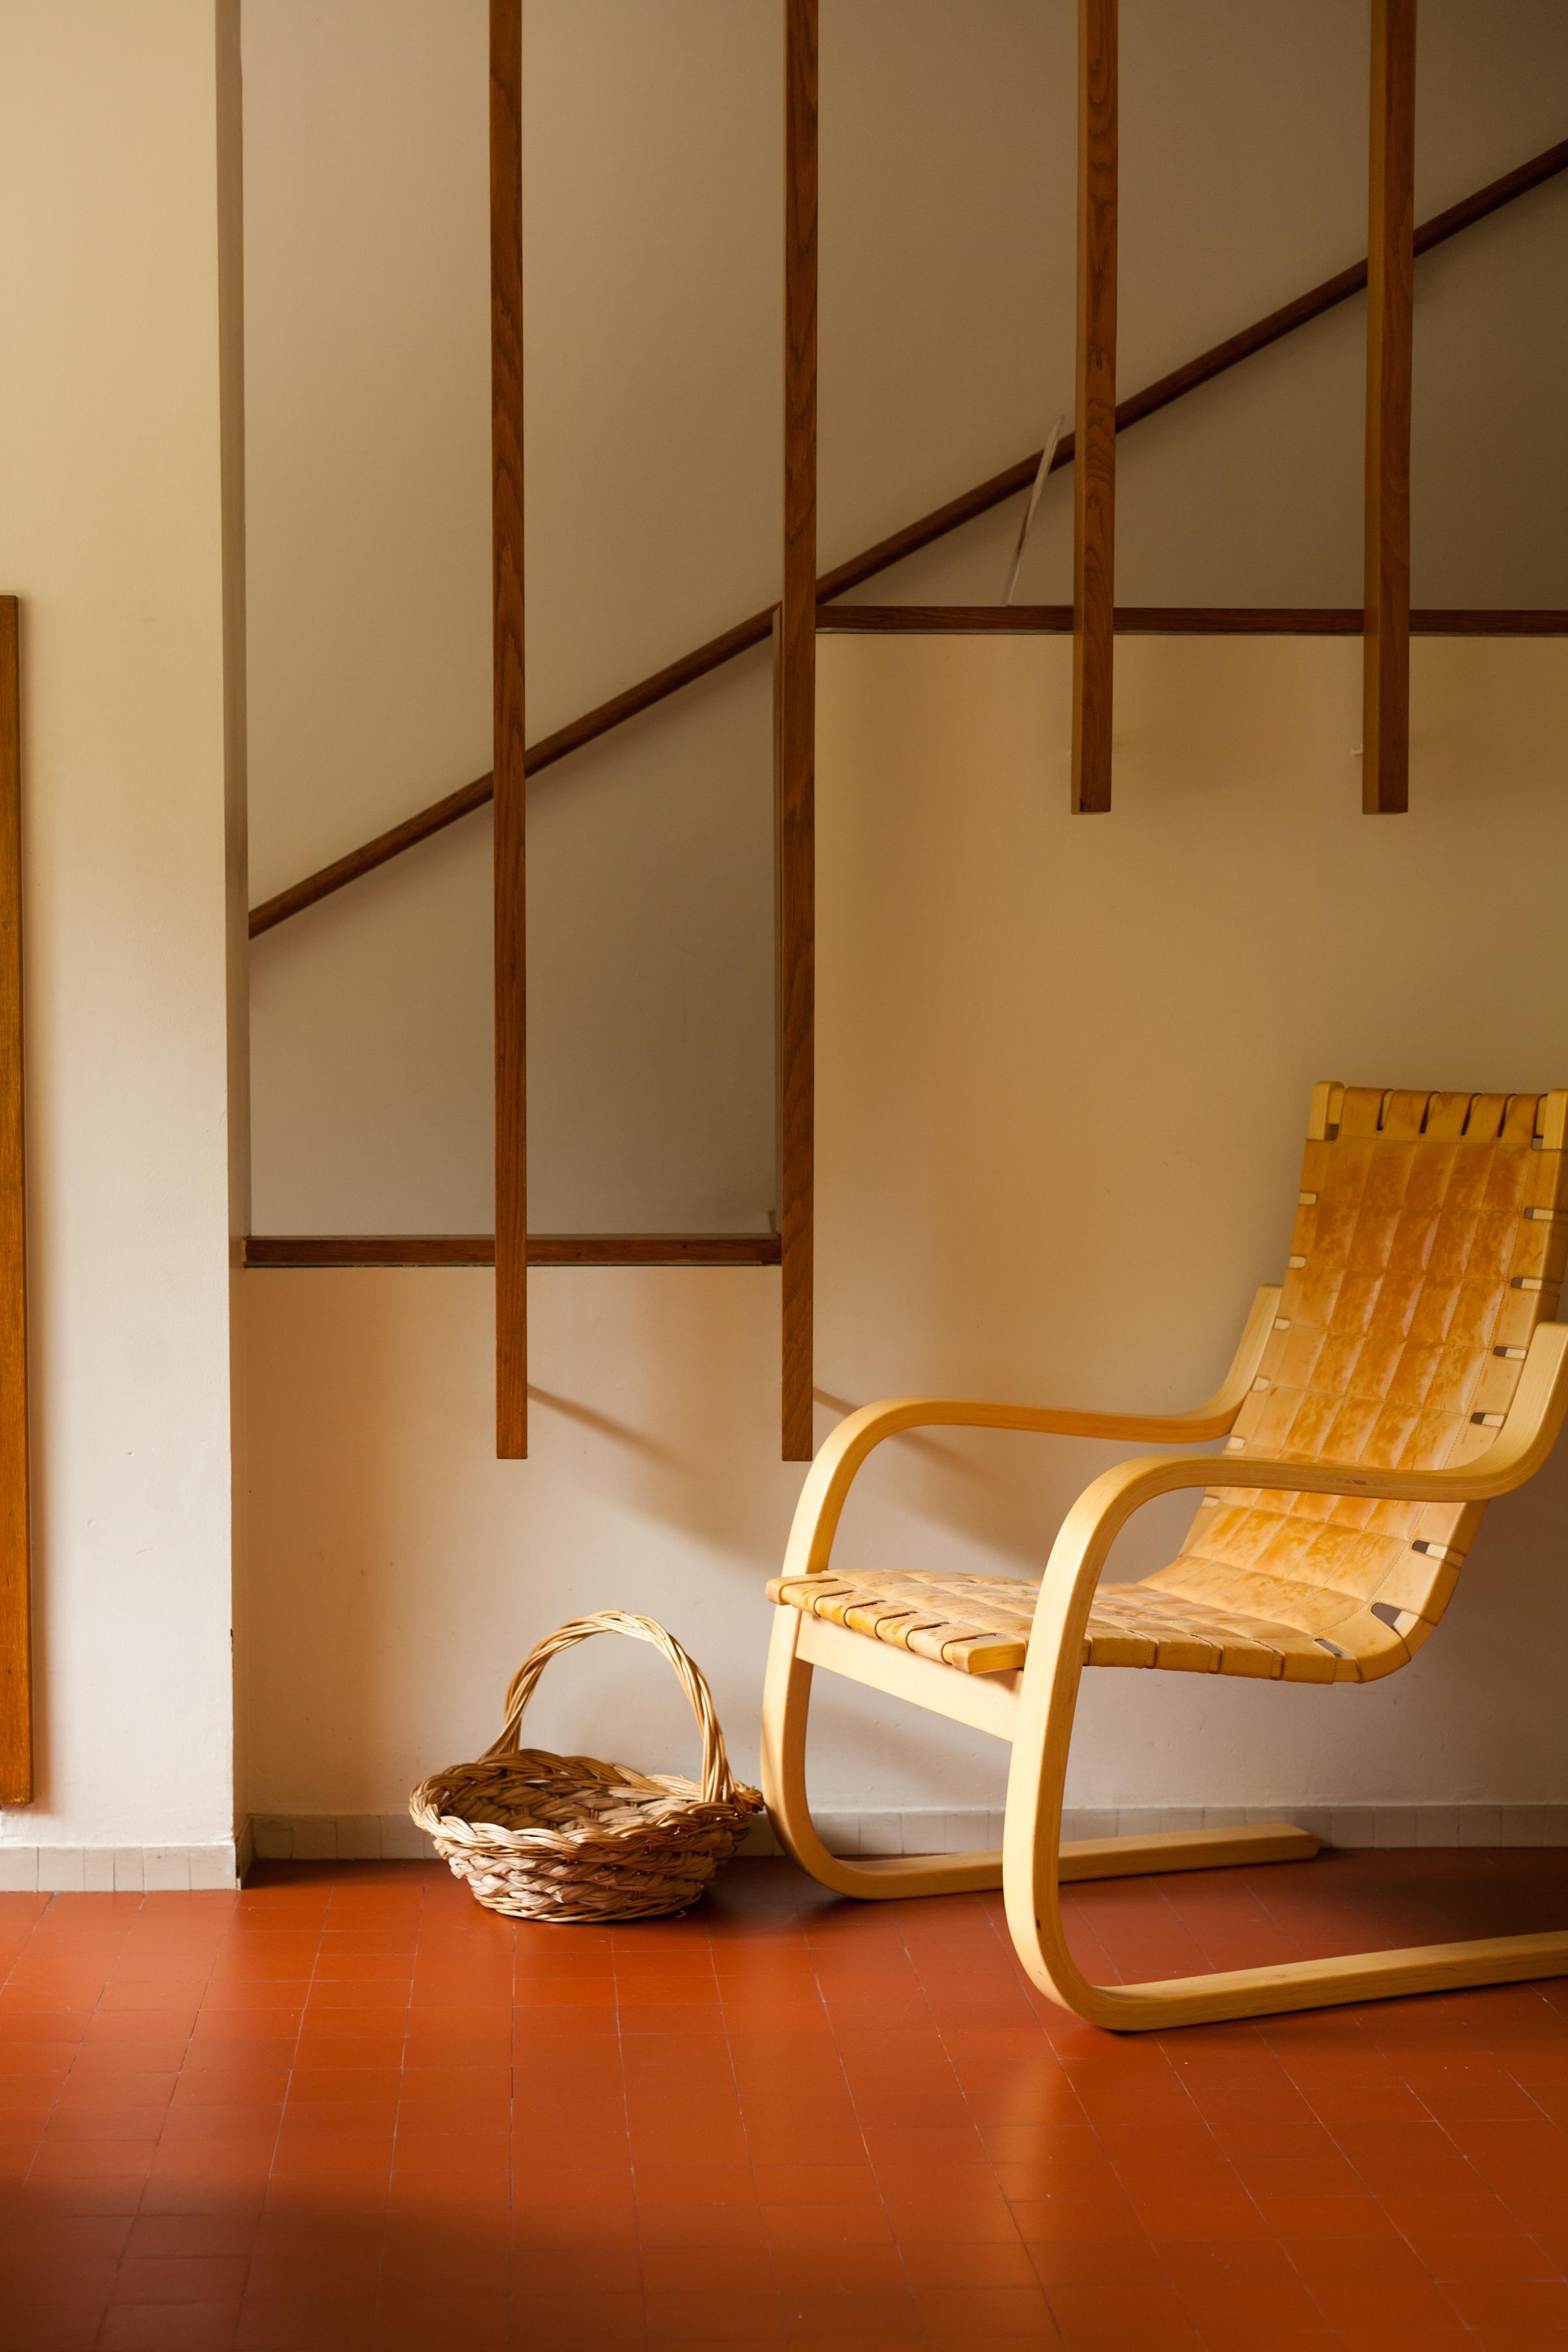 Alvar aalto at kitka design toronto for Alvar aalto maison